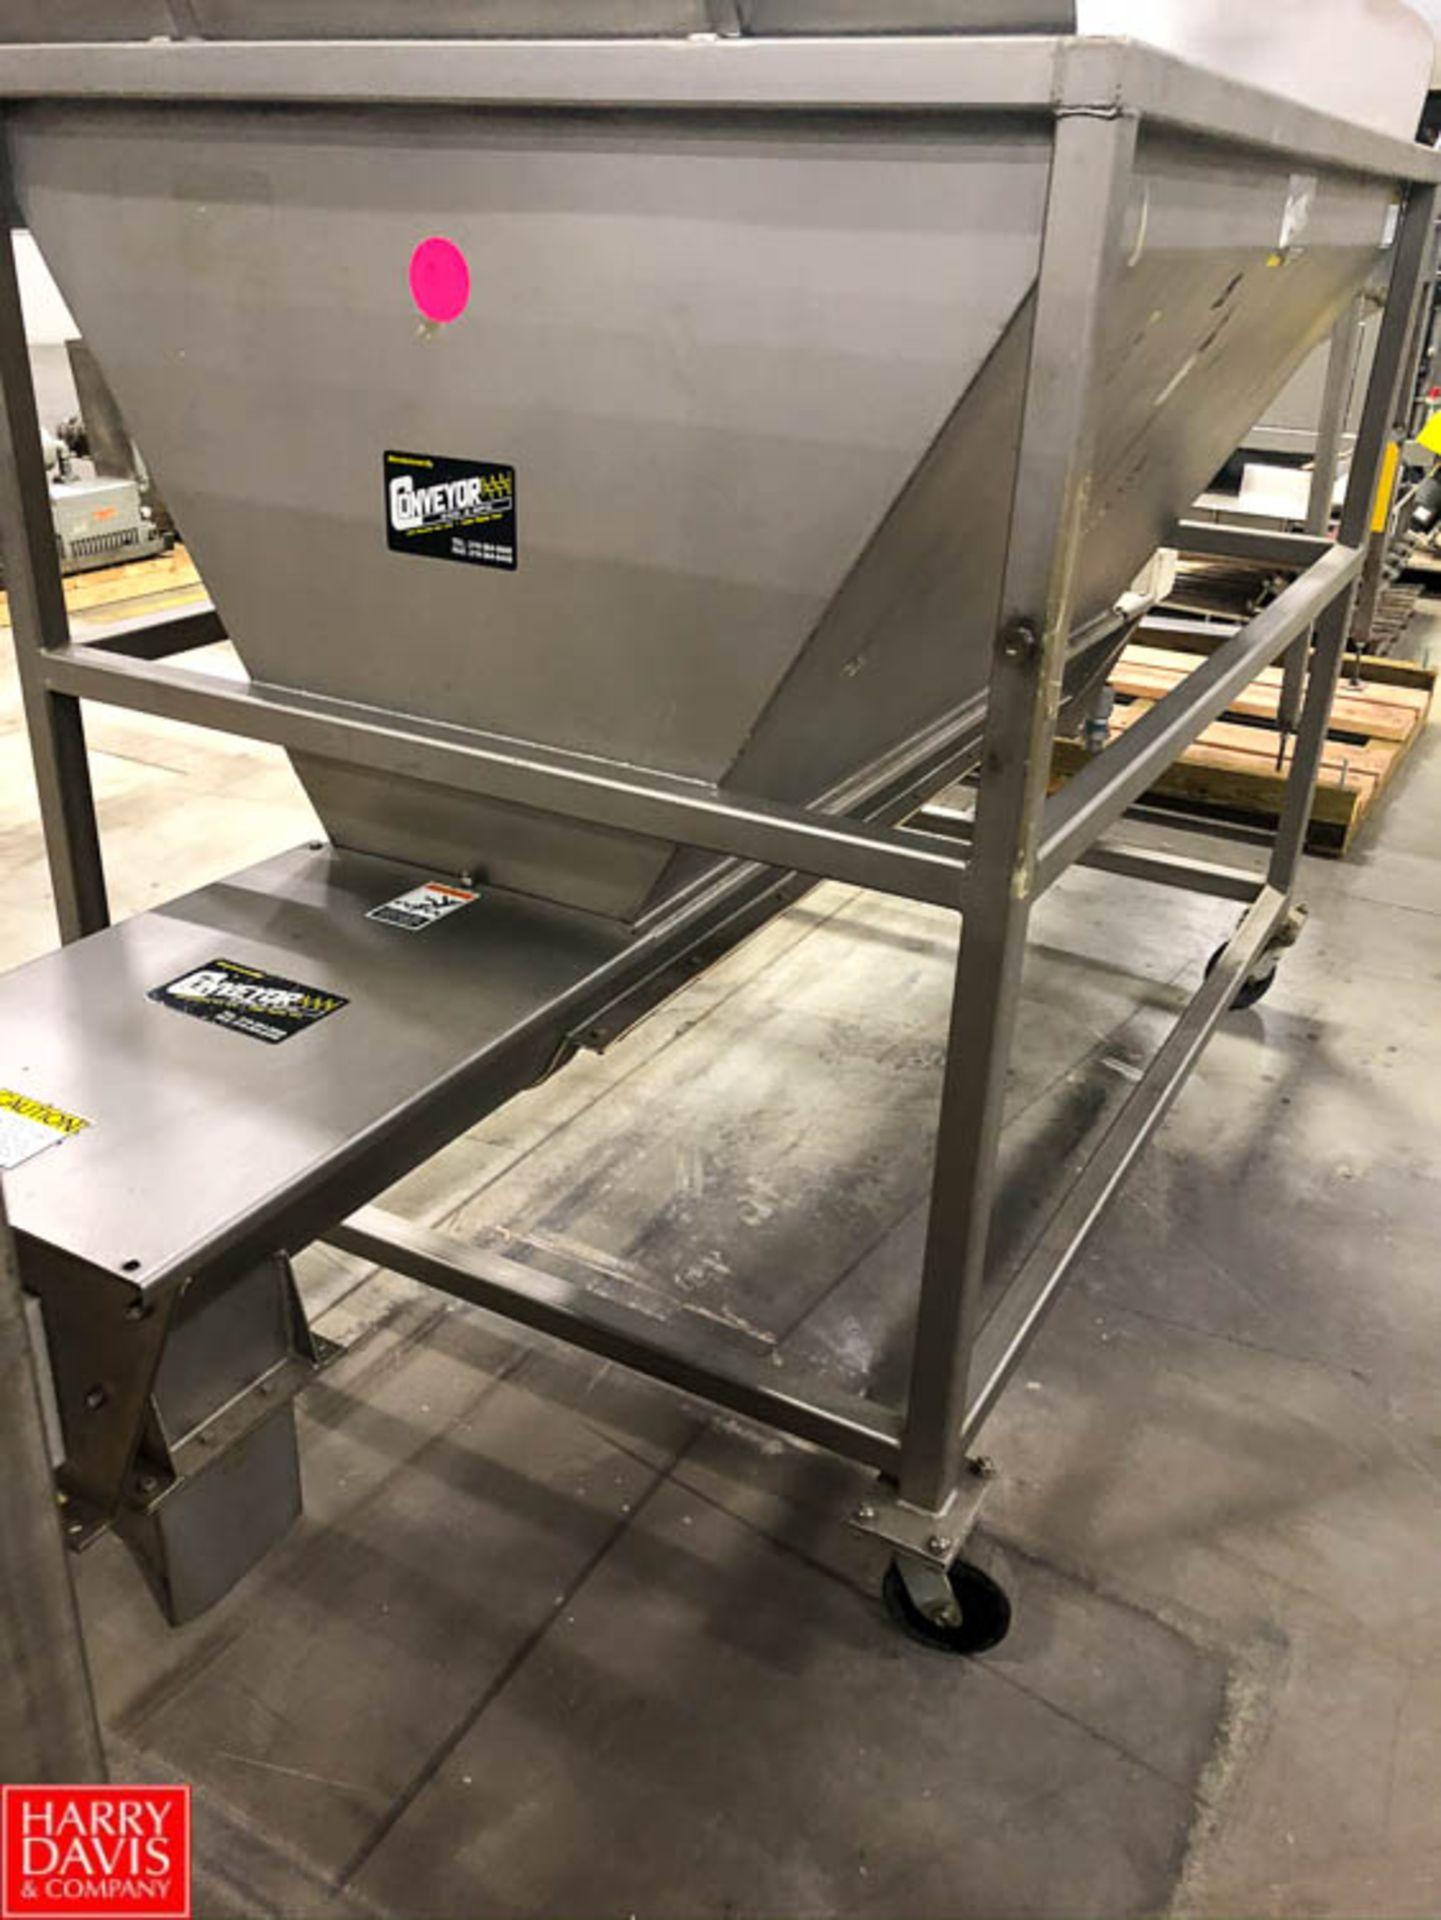 Conveyor Engineering Hopper with Auger Conveyor, 6' x 4.5' Rigging Fee: $75 - Image 3 of 3